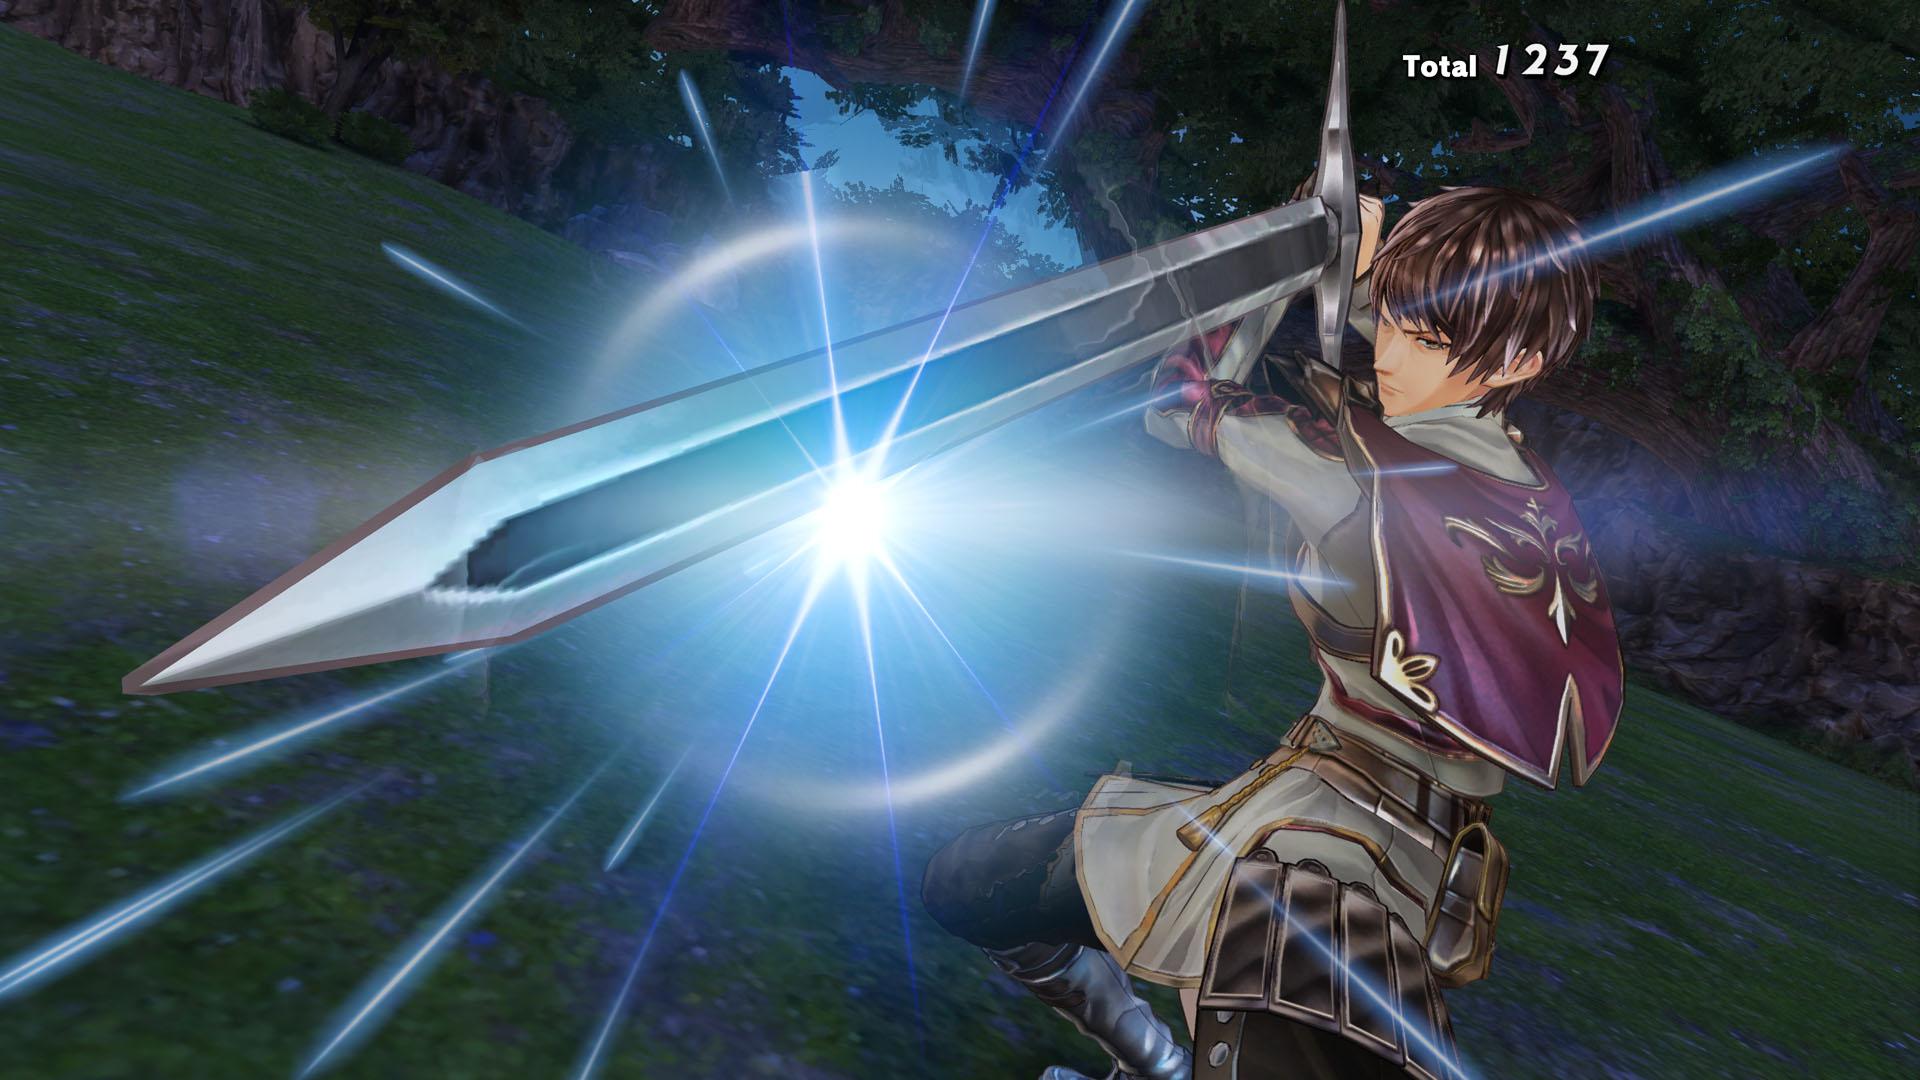 Atelier Lulua ~The Scion Of Arland~ Digital Deluxe Edition